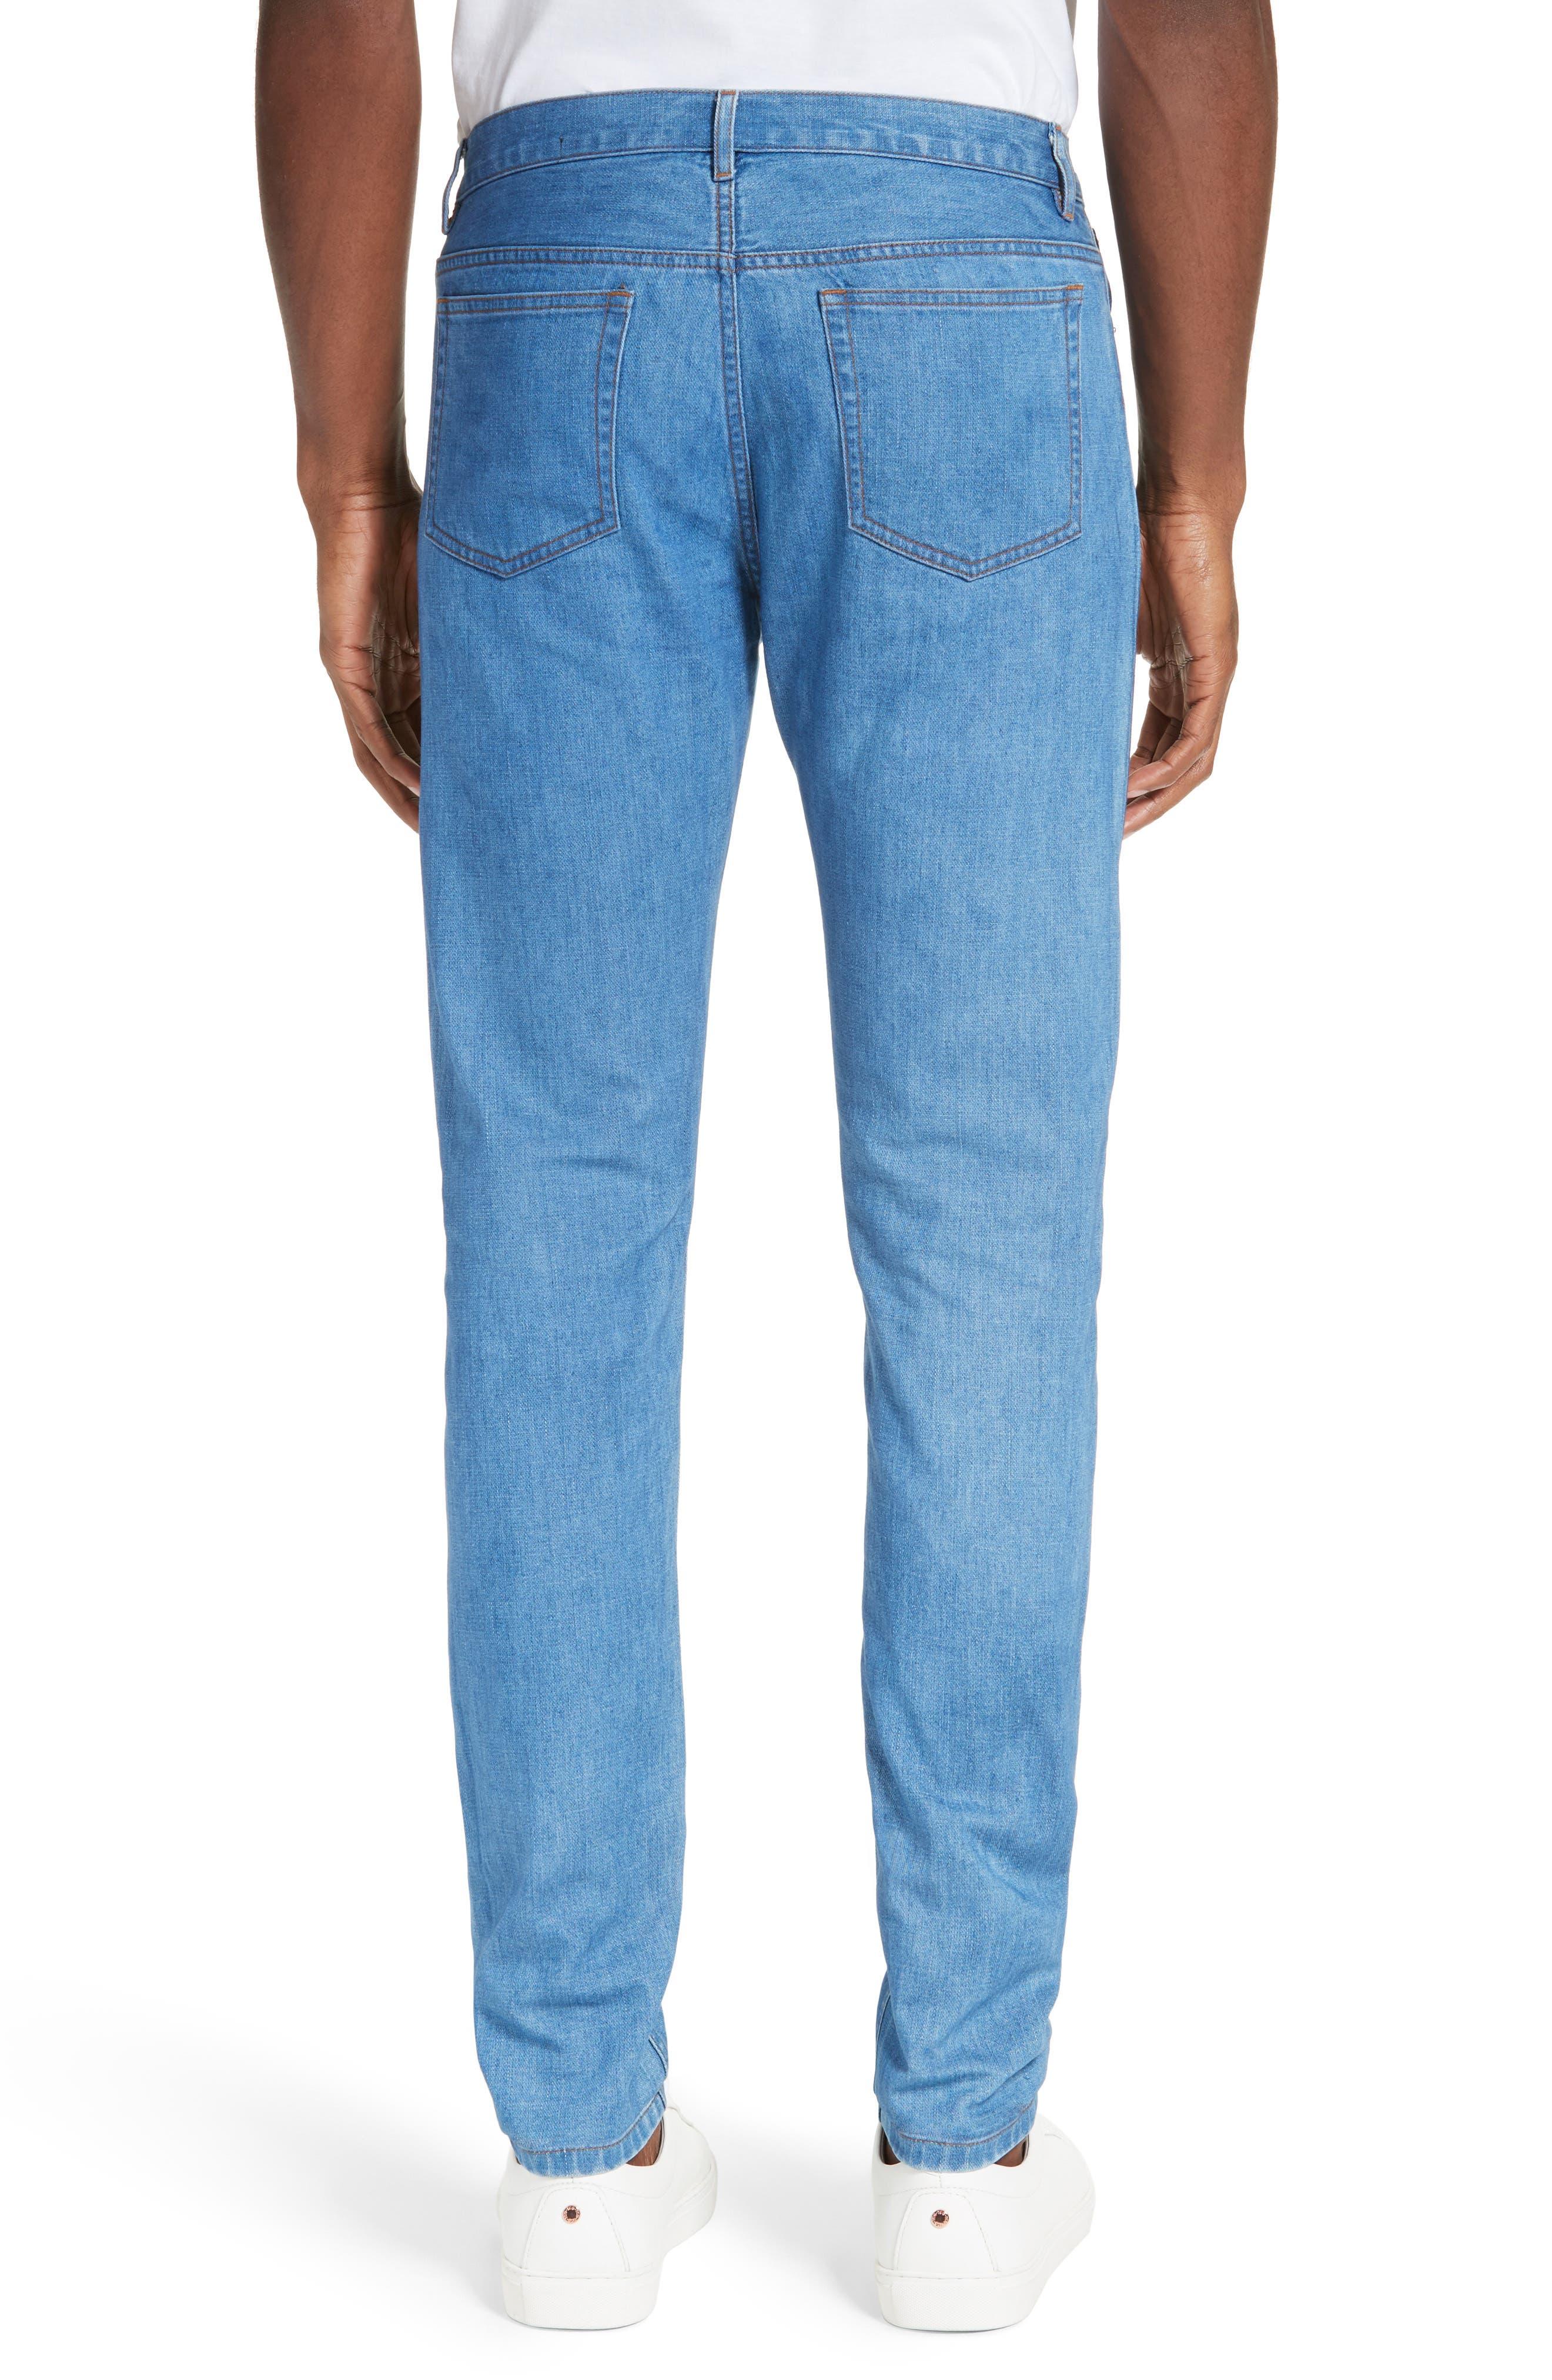 Petit New Standard Slim Fit Jeans,                             Main thumbnail 1, color,                             461